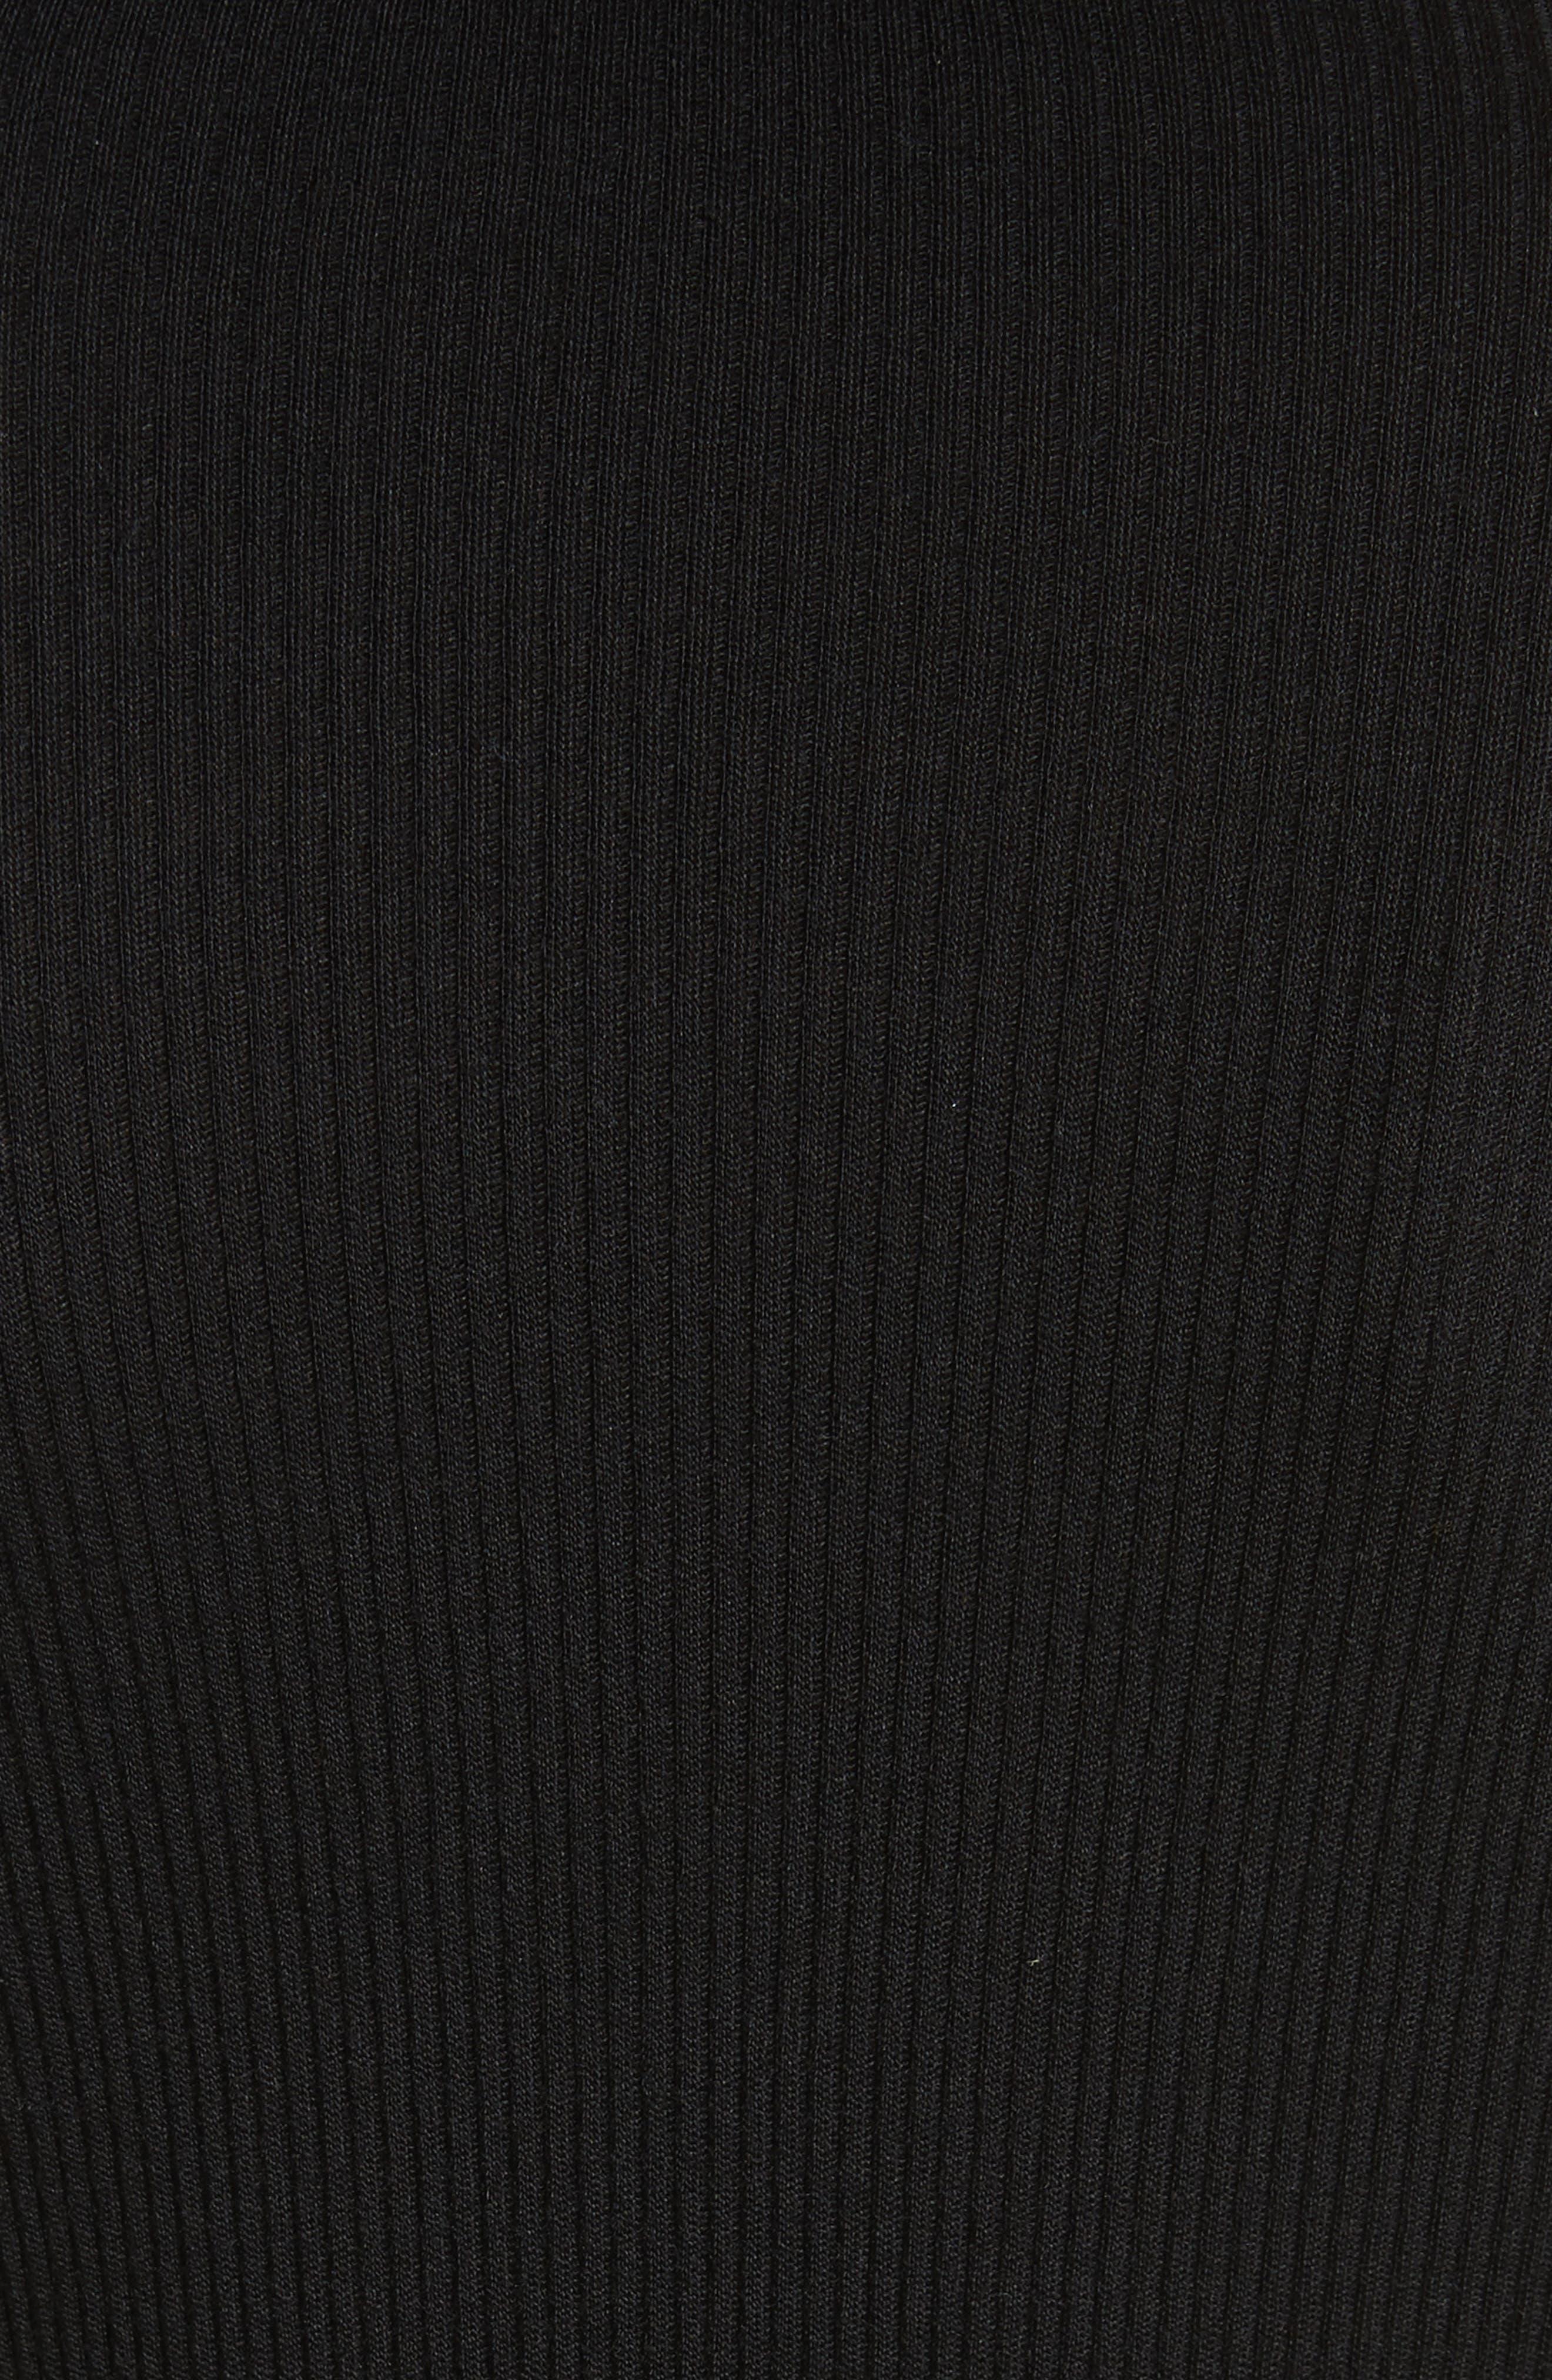 Ribbed Wool Blend Cardigan,                             Alternate thumbnail 5, color,                             Black